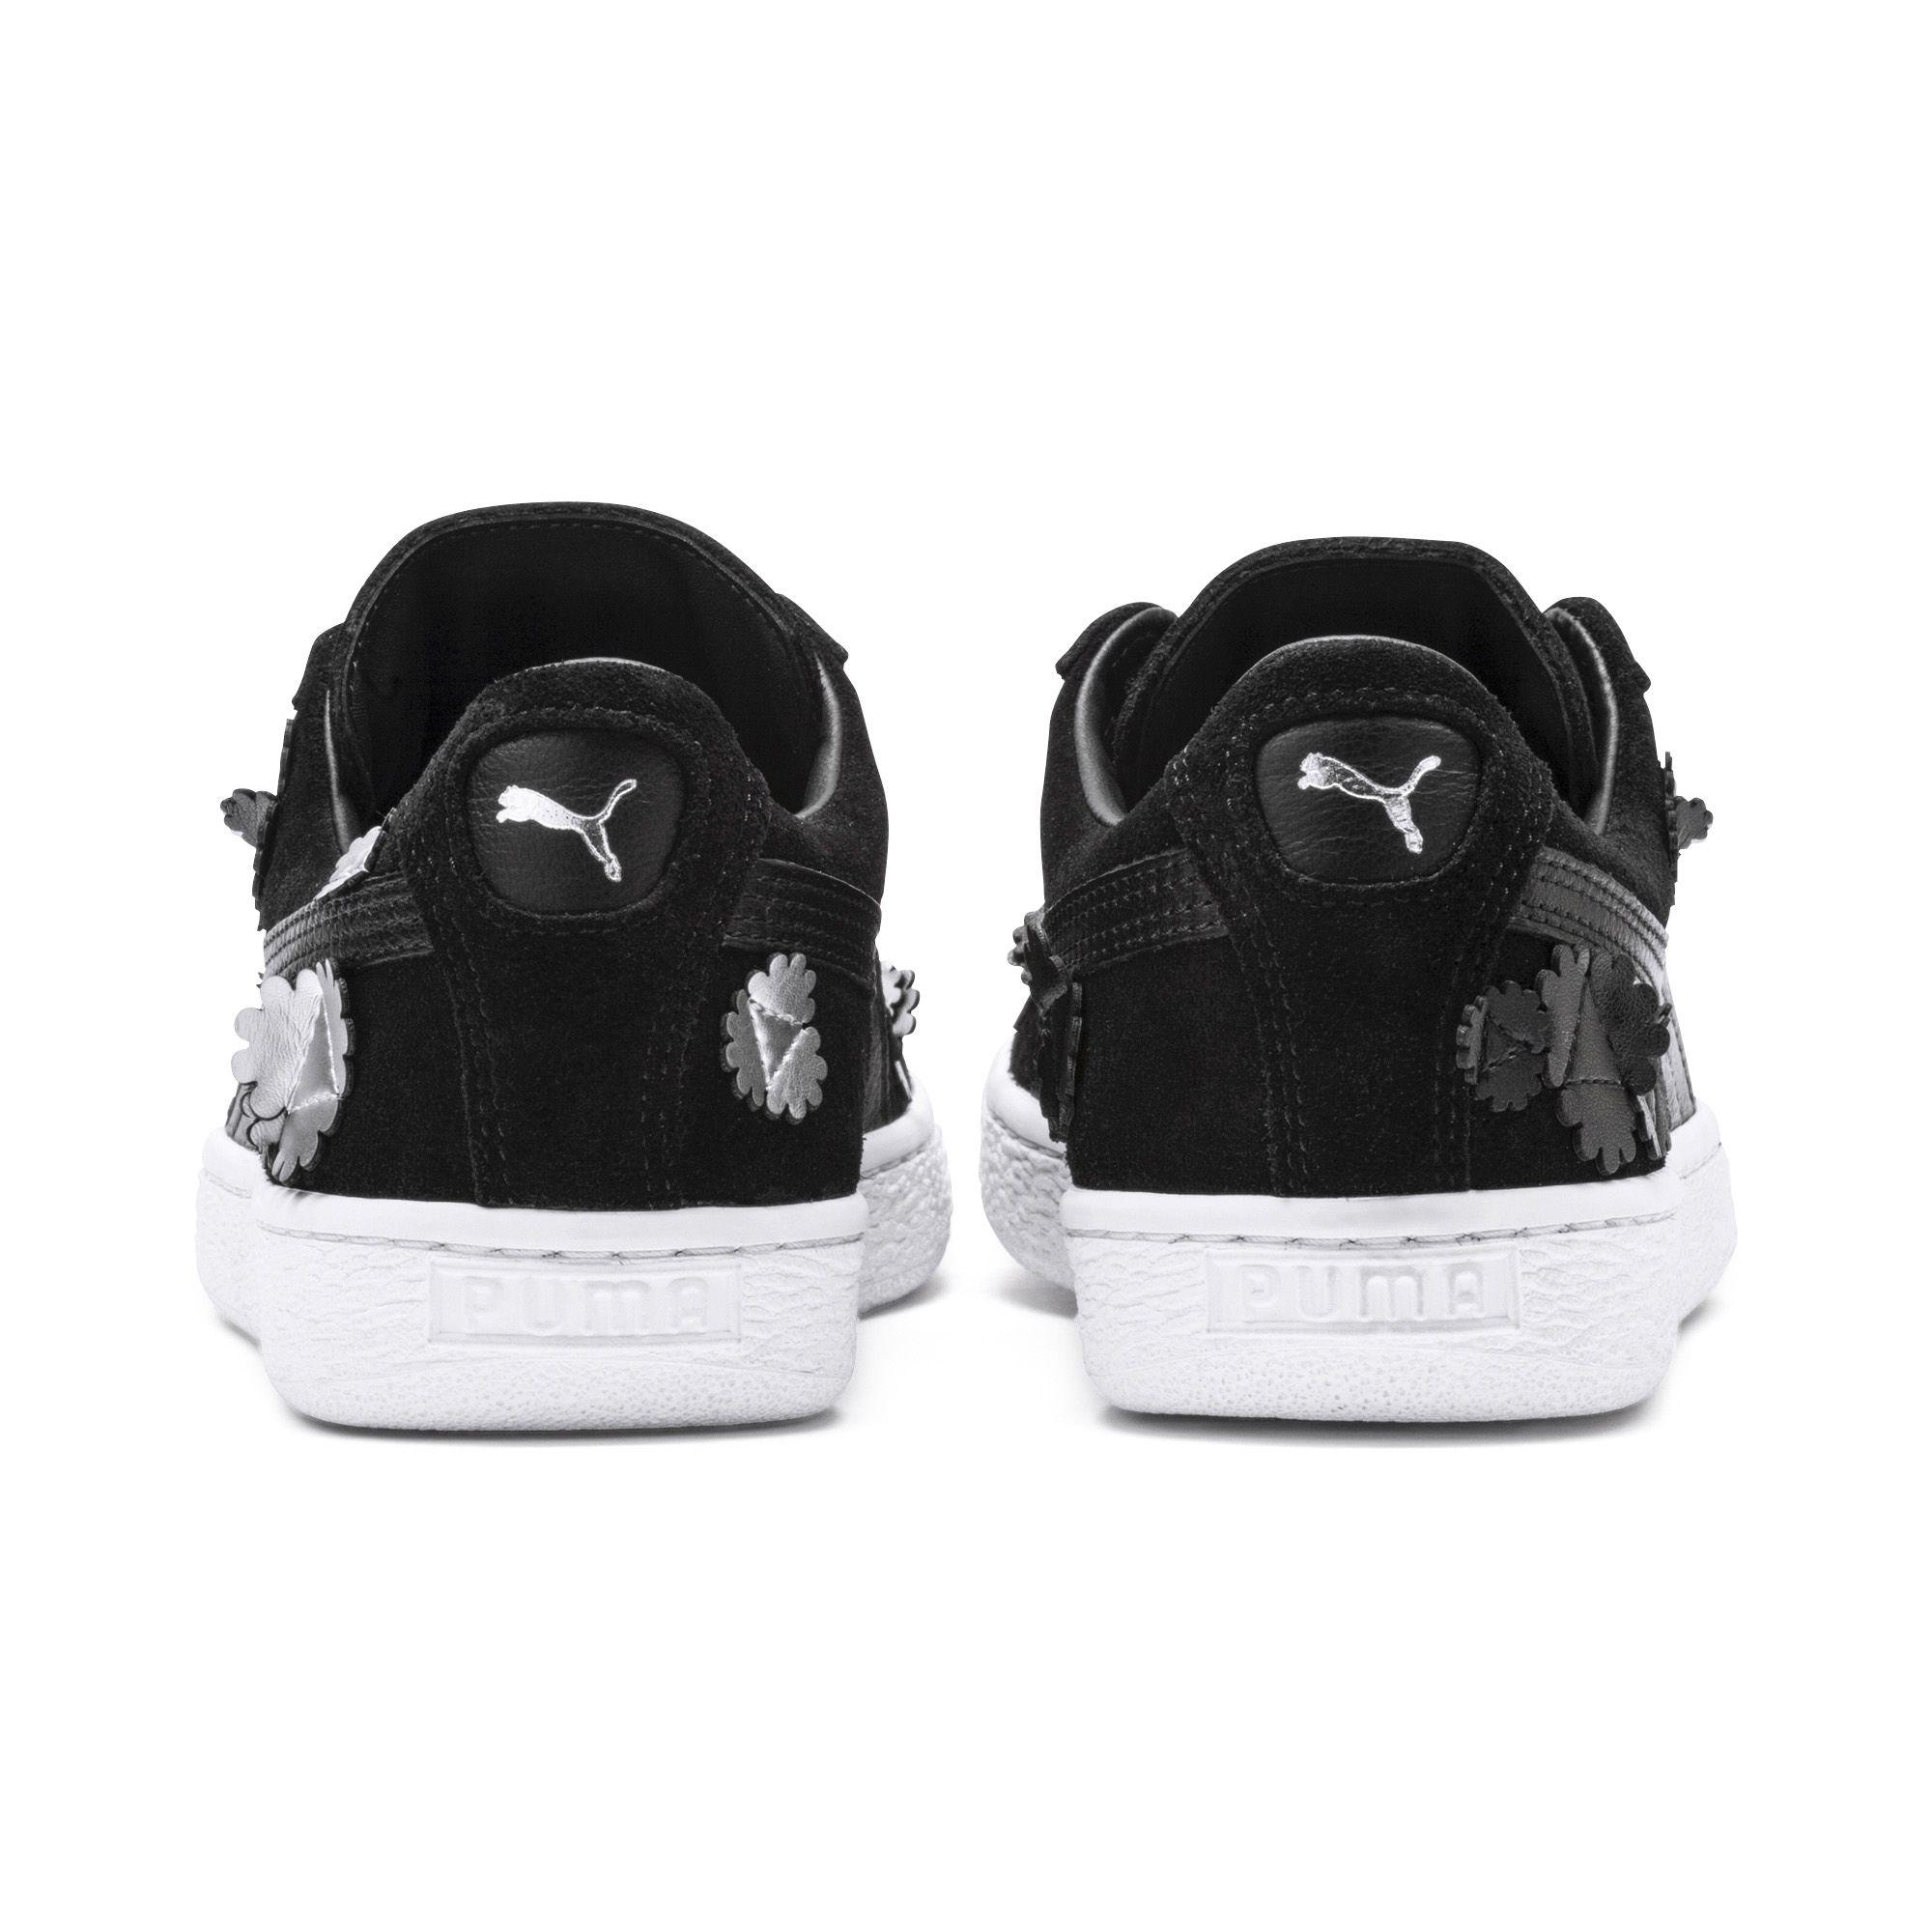 7efa6ddf8167 PUMA - Black Suede Classic Autumn Bloom Women s Sneakers - Lyst. View  fullscreen